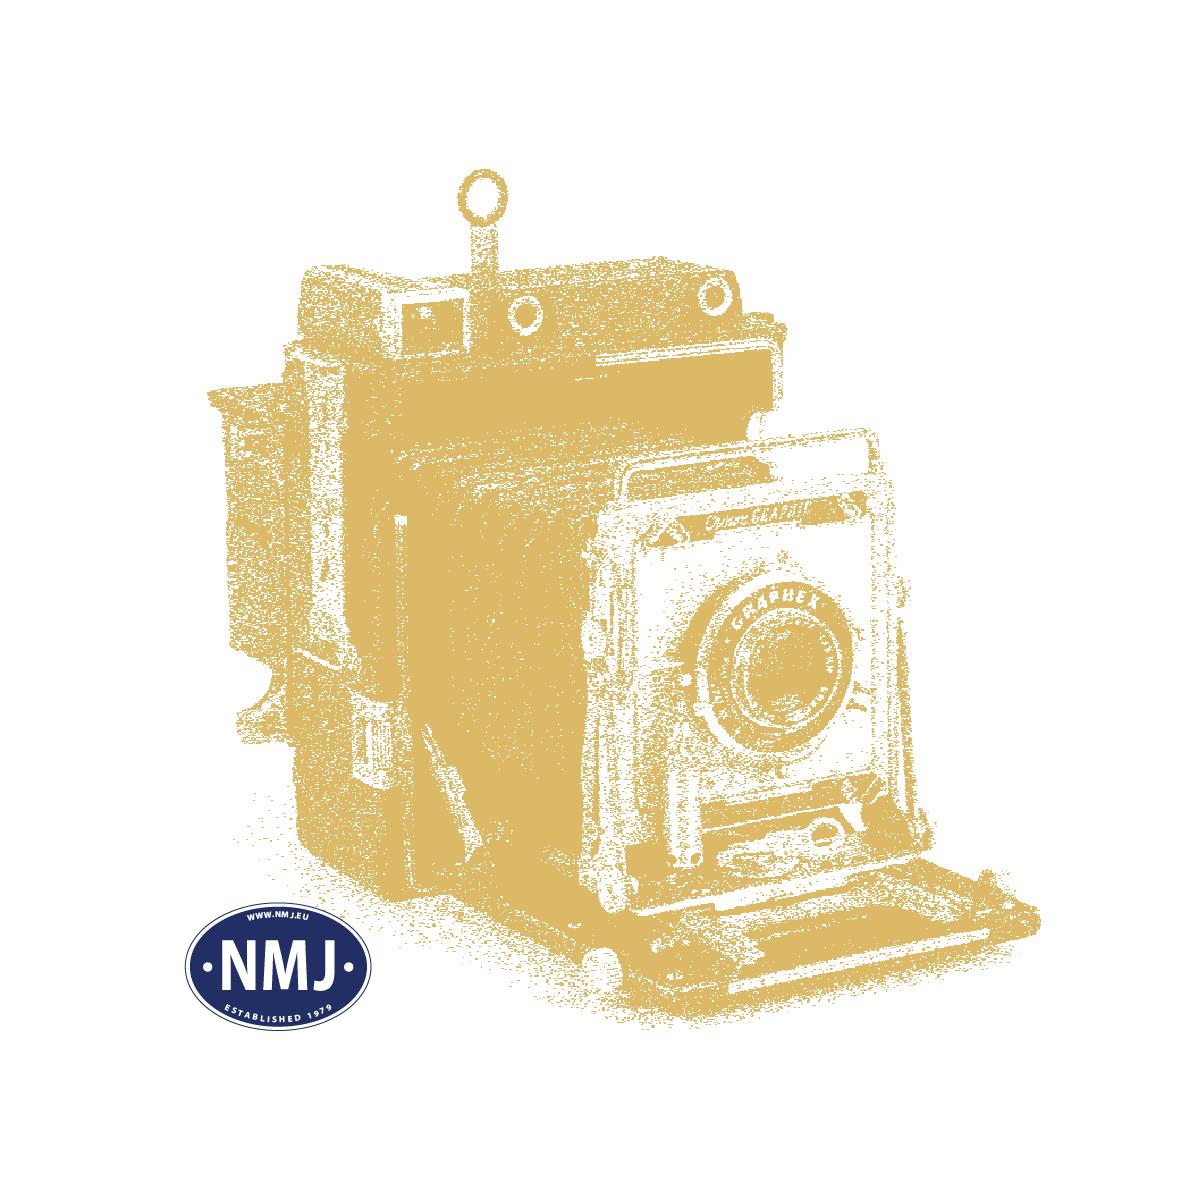 NMJ0.21304 - NMJ Superline NSB DF37.21304, 0-Scala